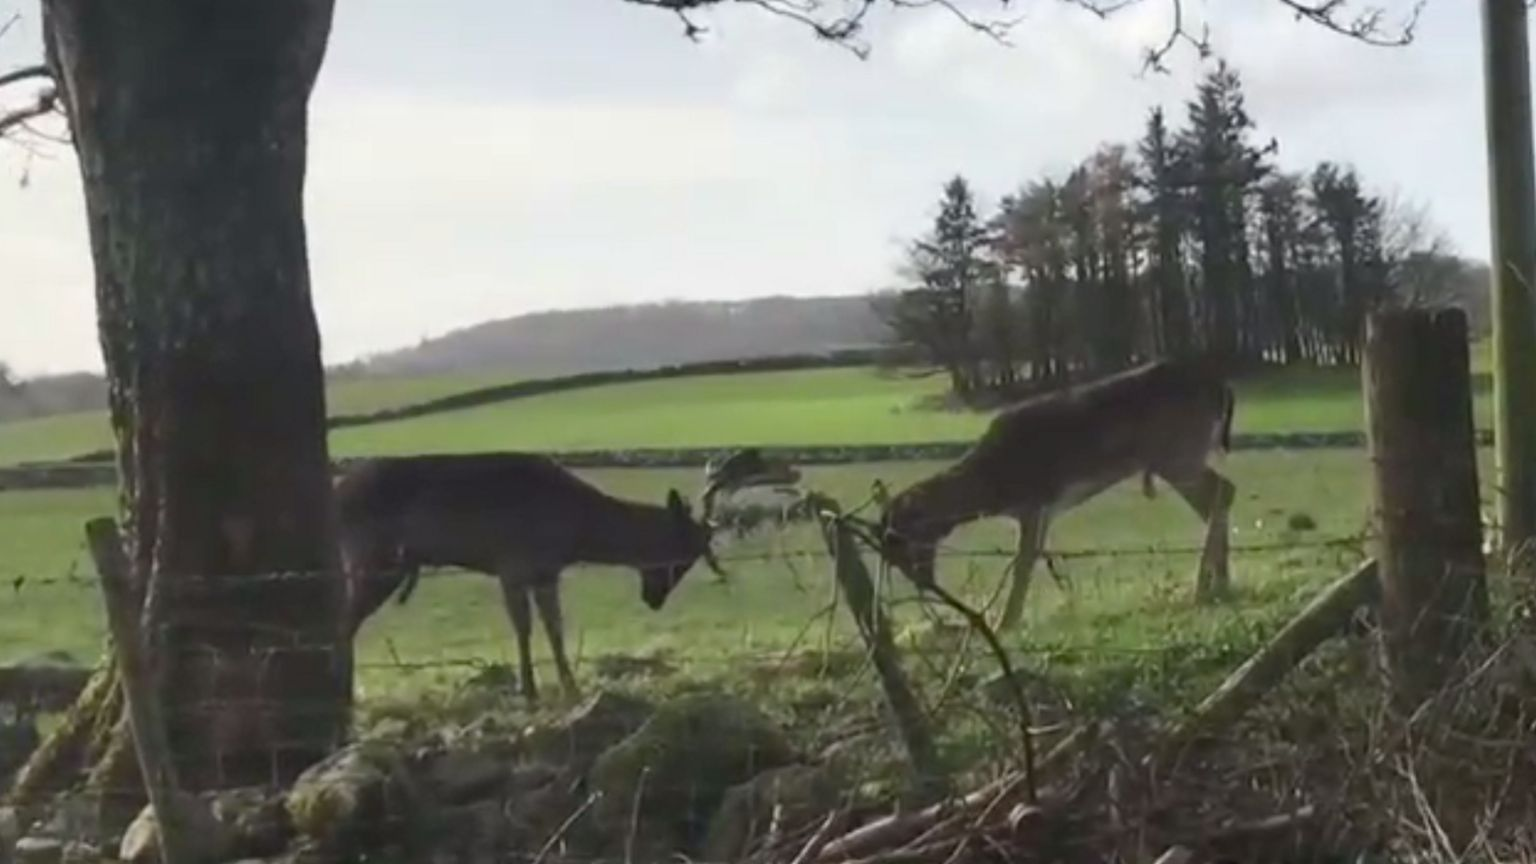 Tangled deer